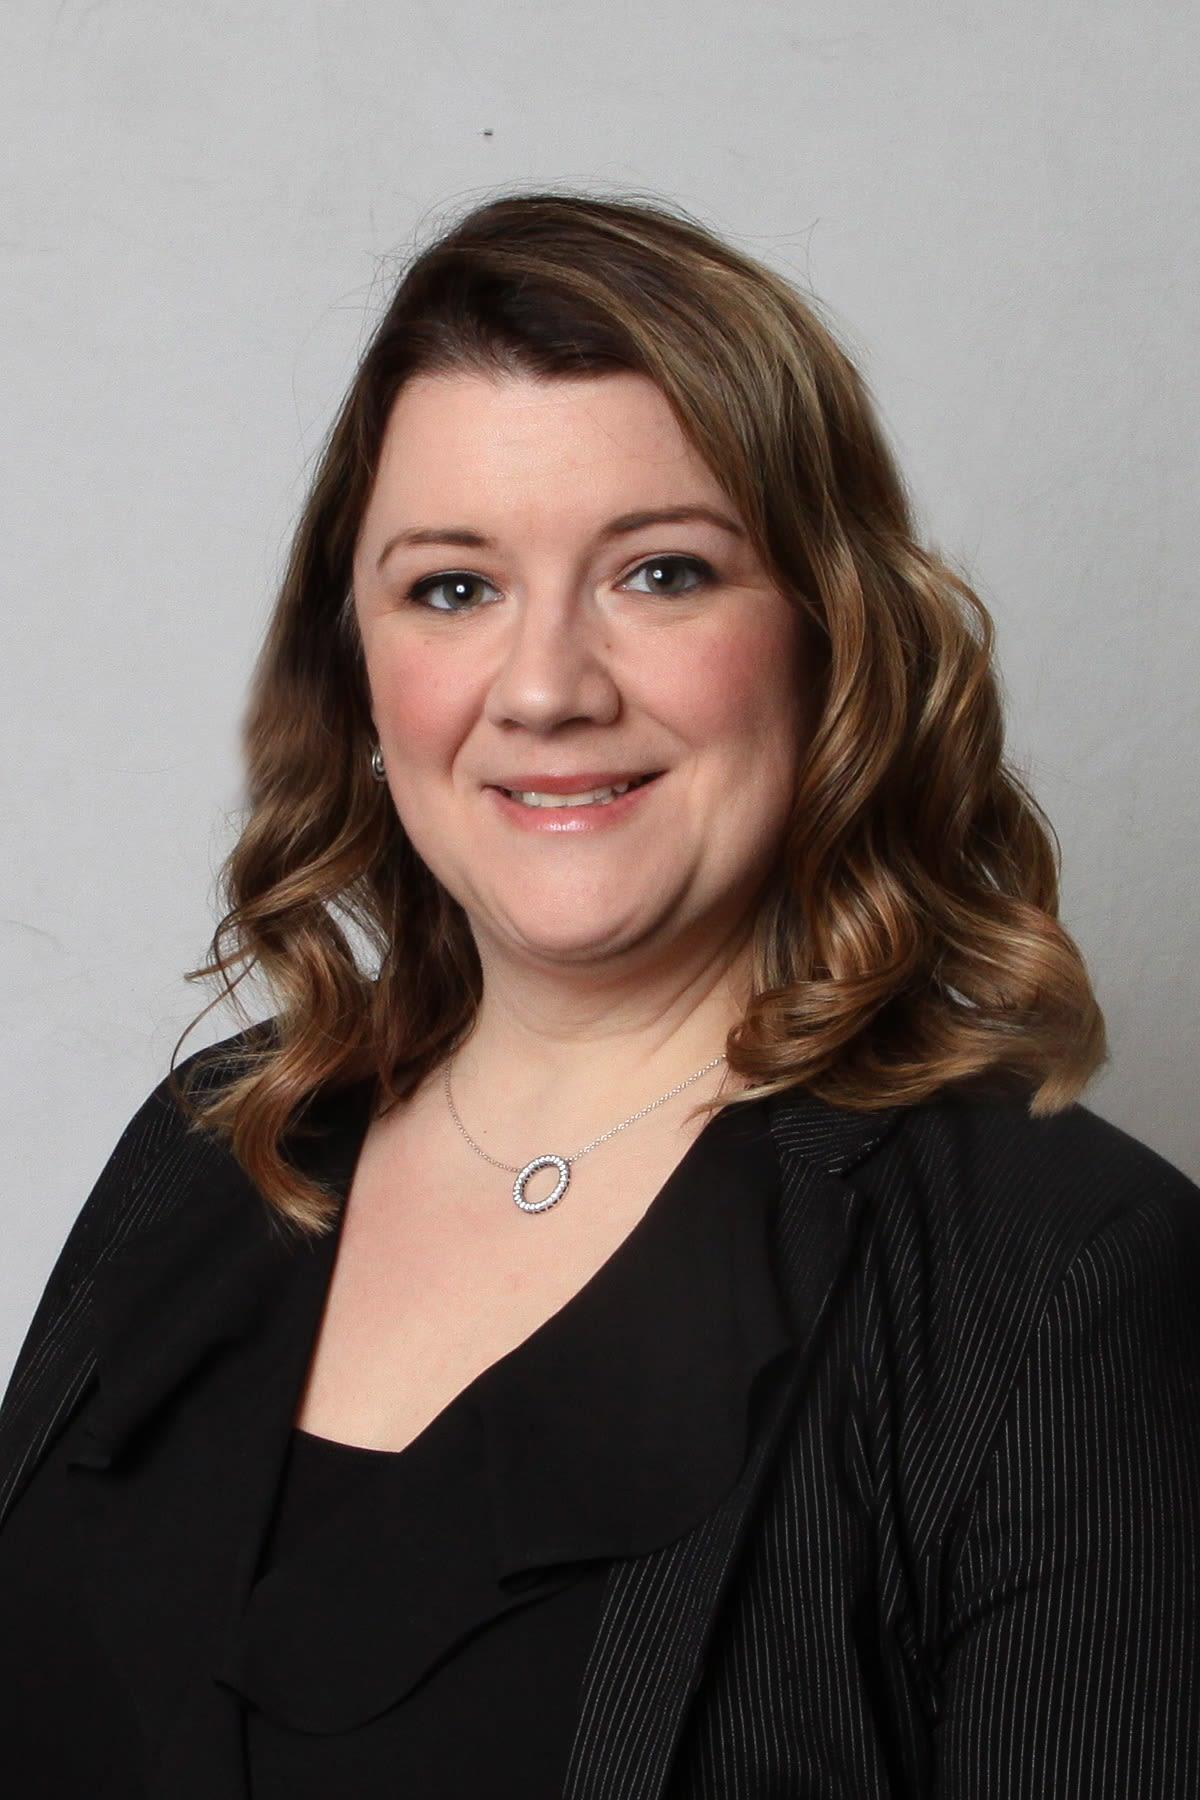 Angela Roden, Regional Director